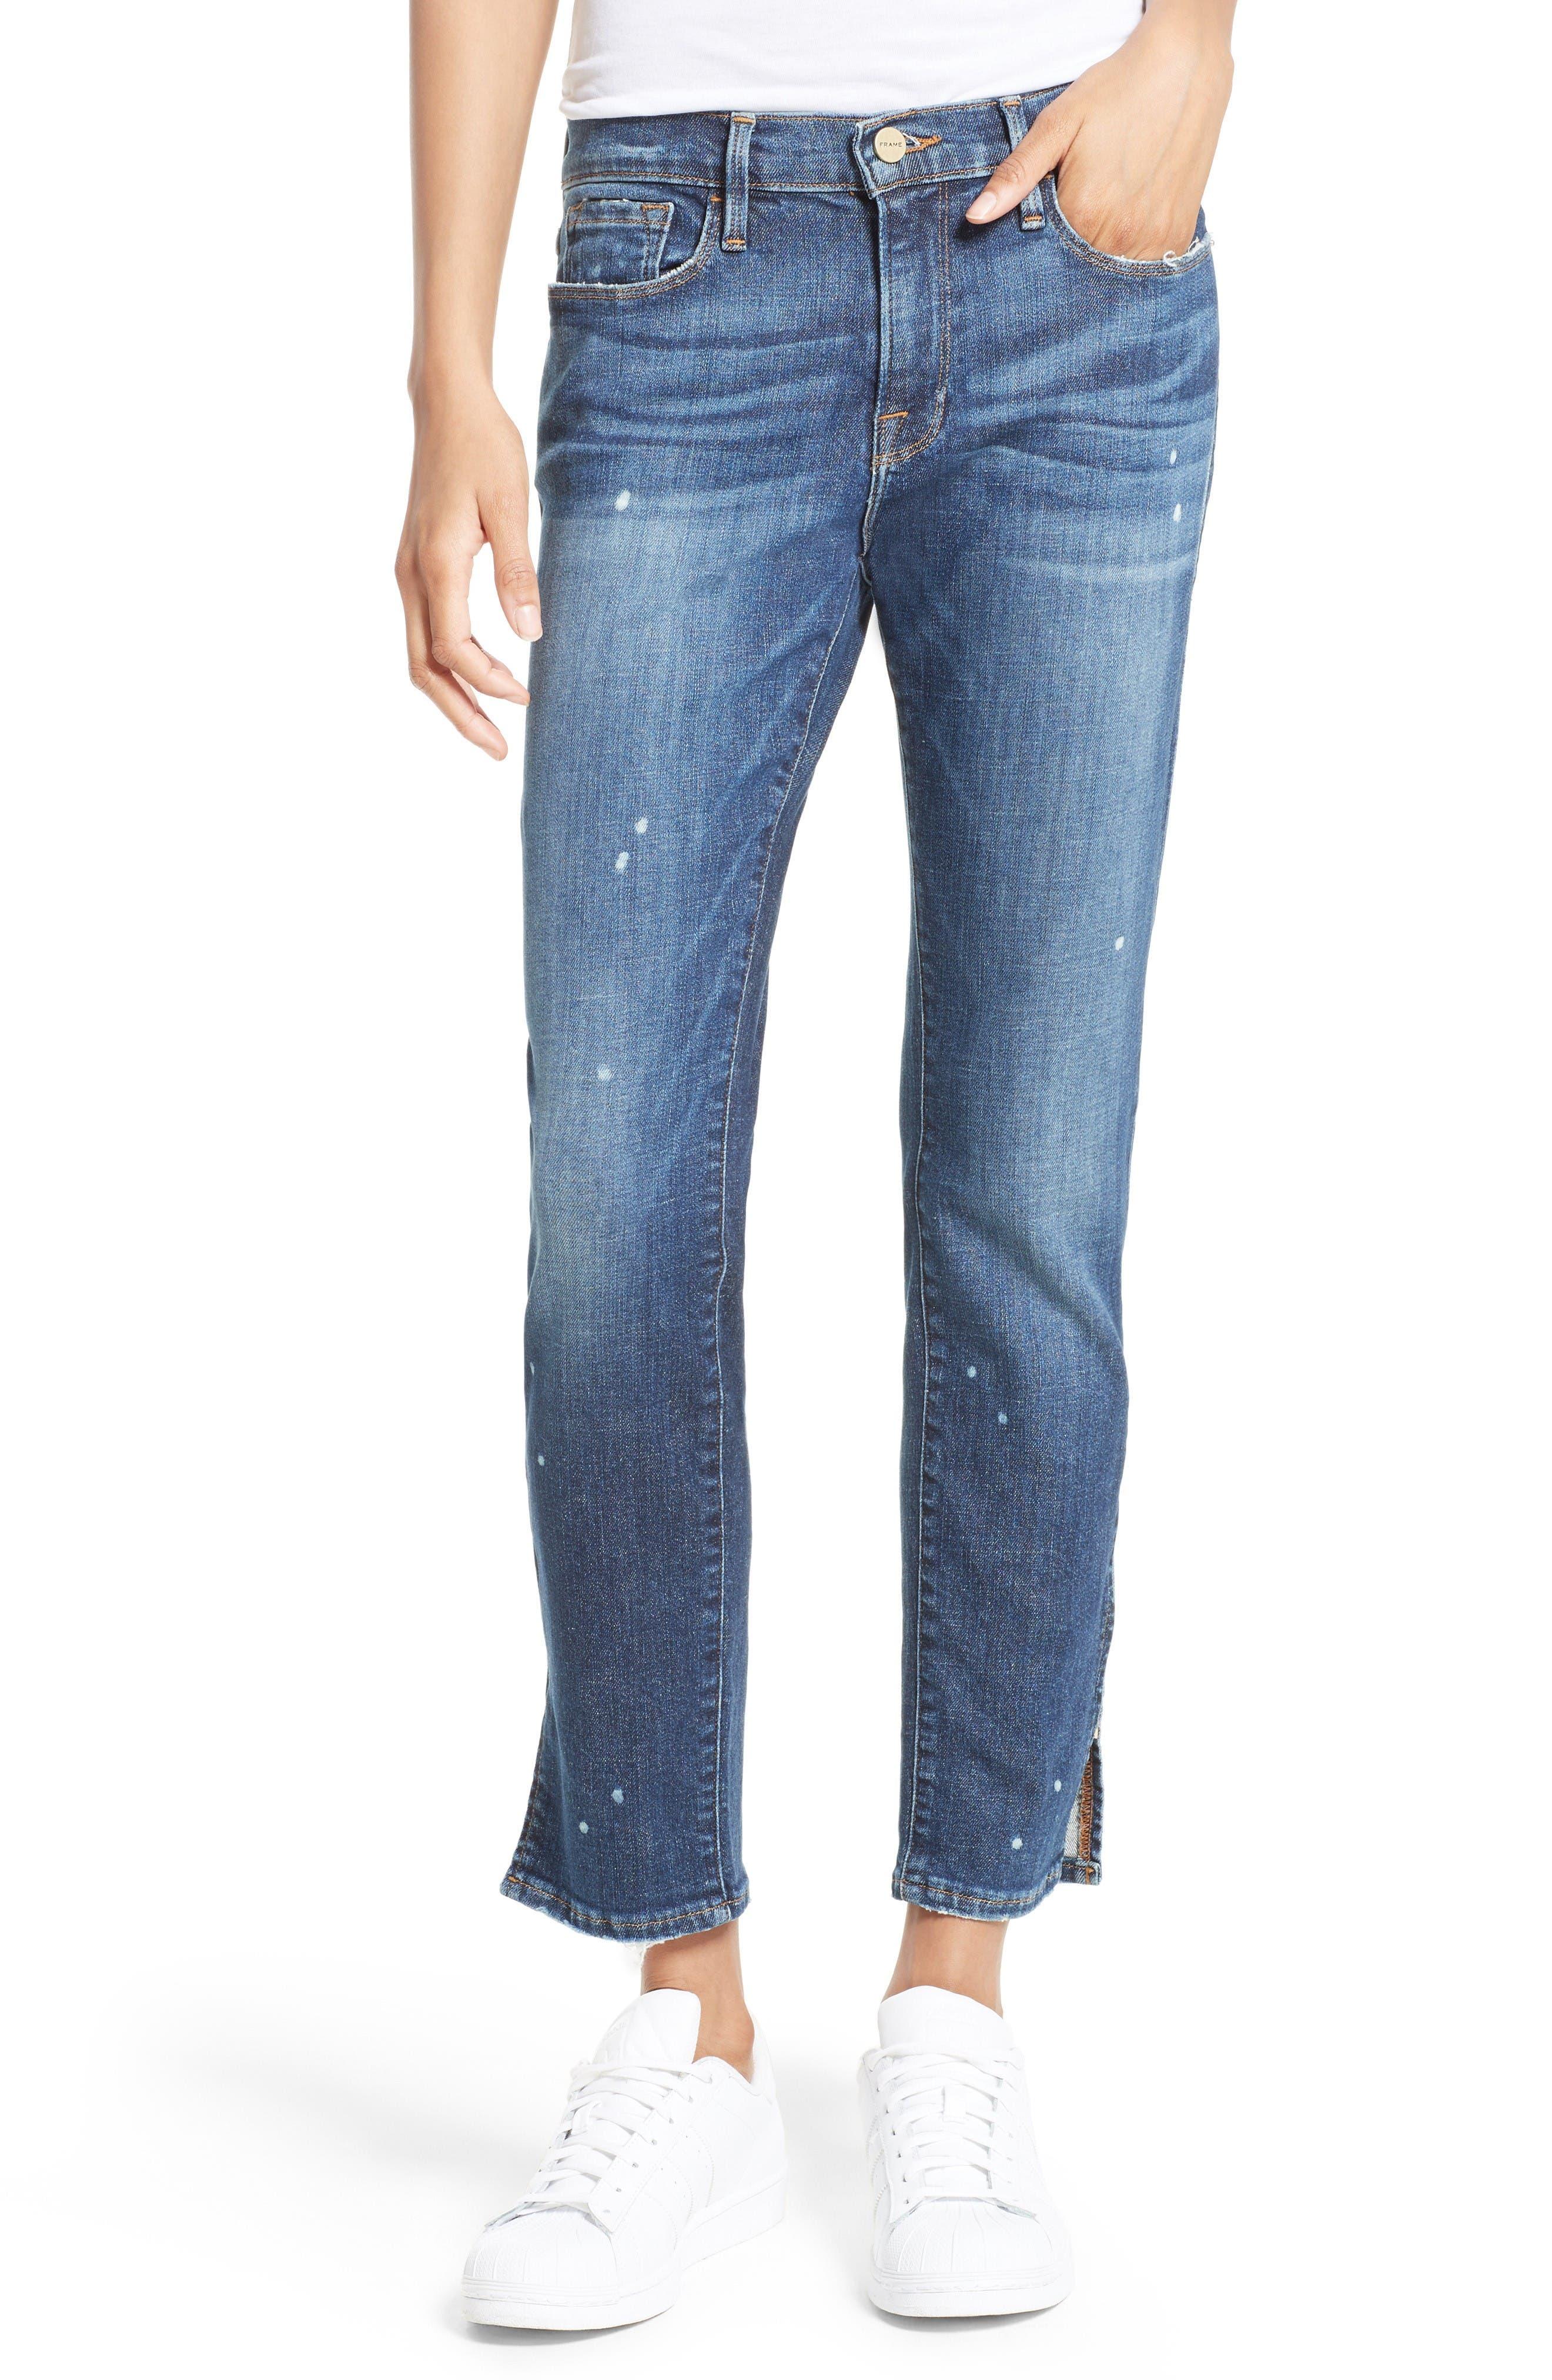 Alternate Image 1 Selected - FRAME Le Garcon Slim Zip Hem Jeans (Marion)